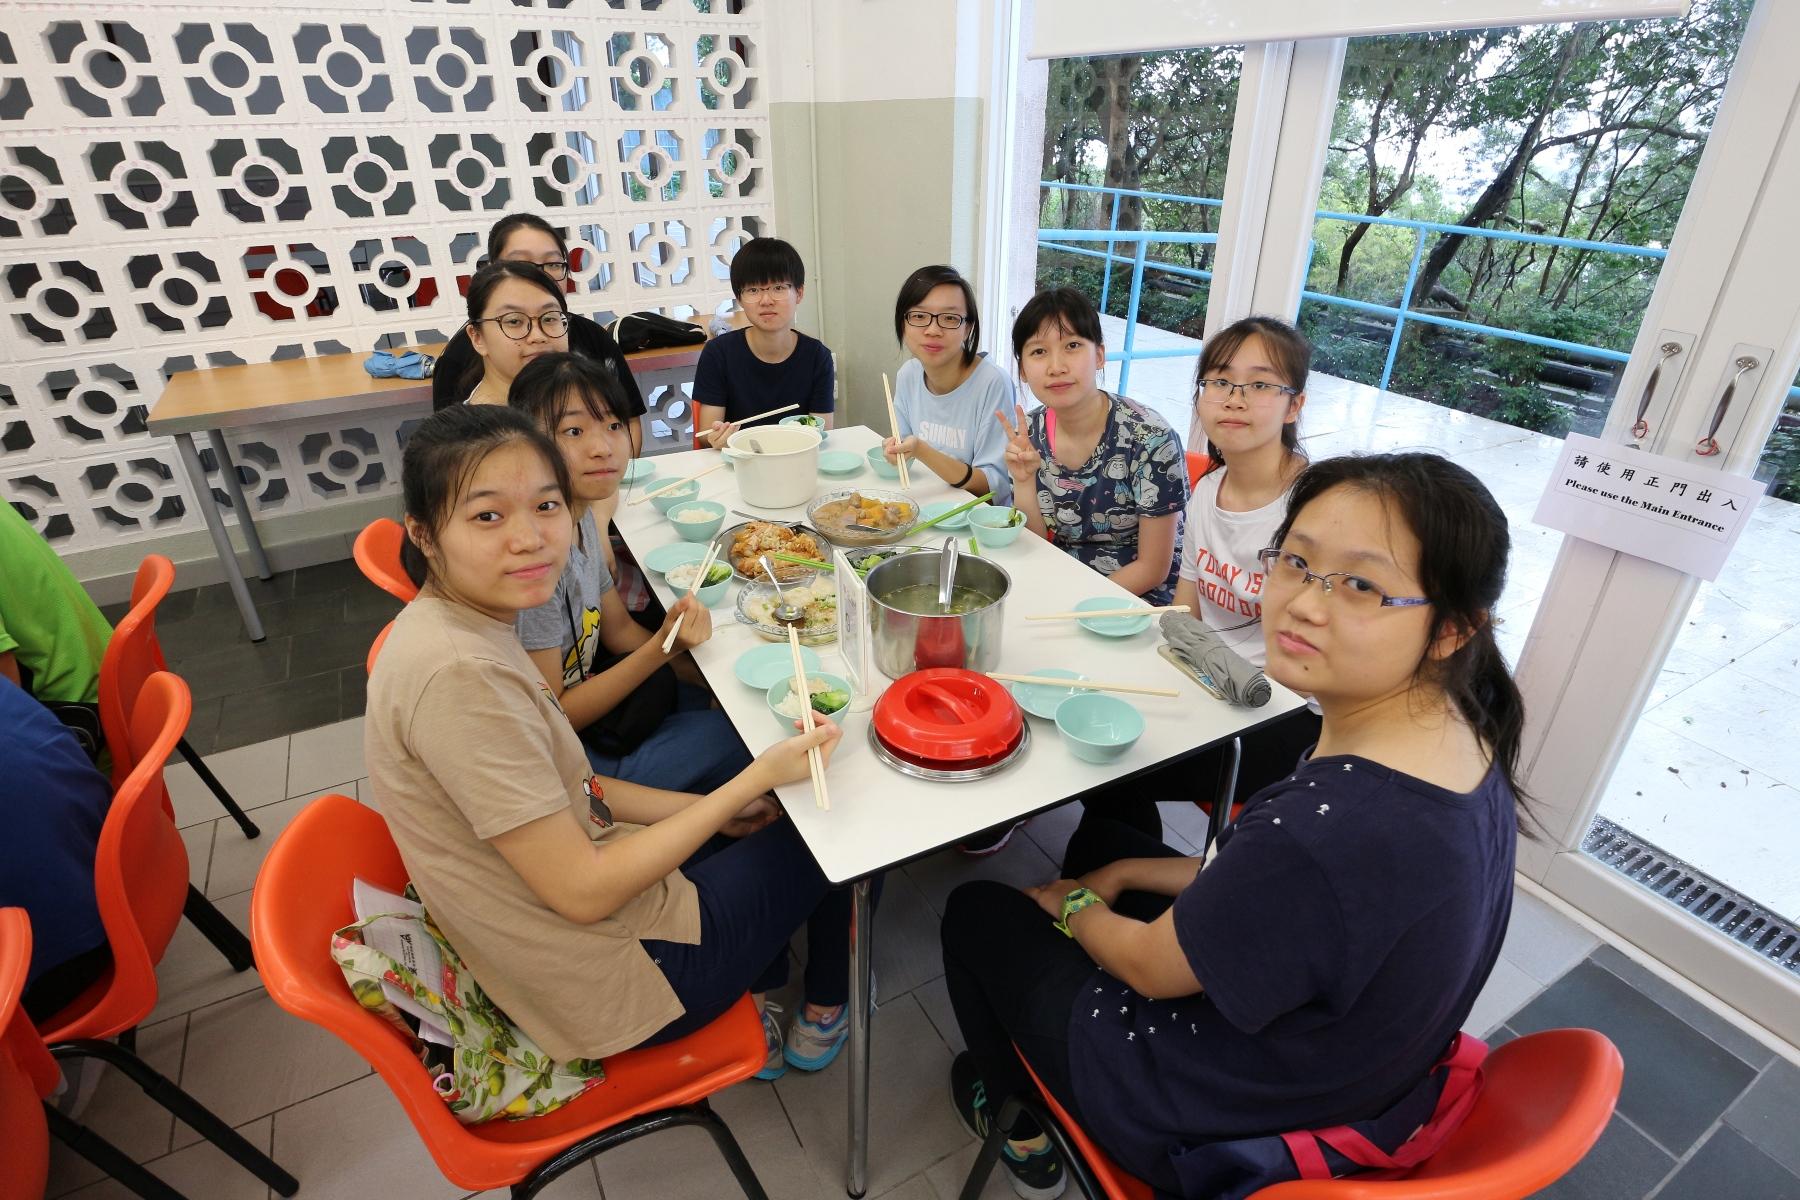 http://www.npc.edu.hk/sites/default/files/img_0586.jpg